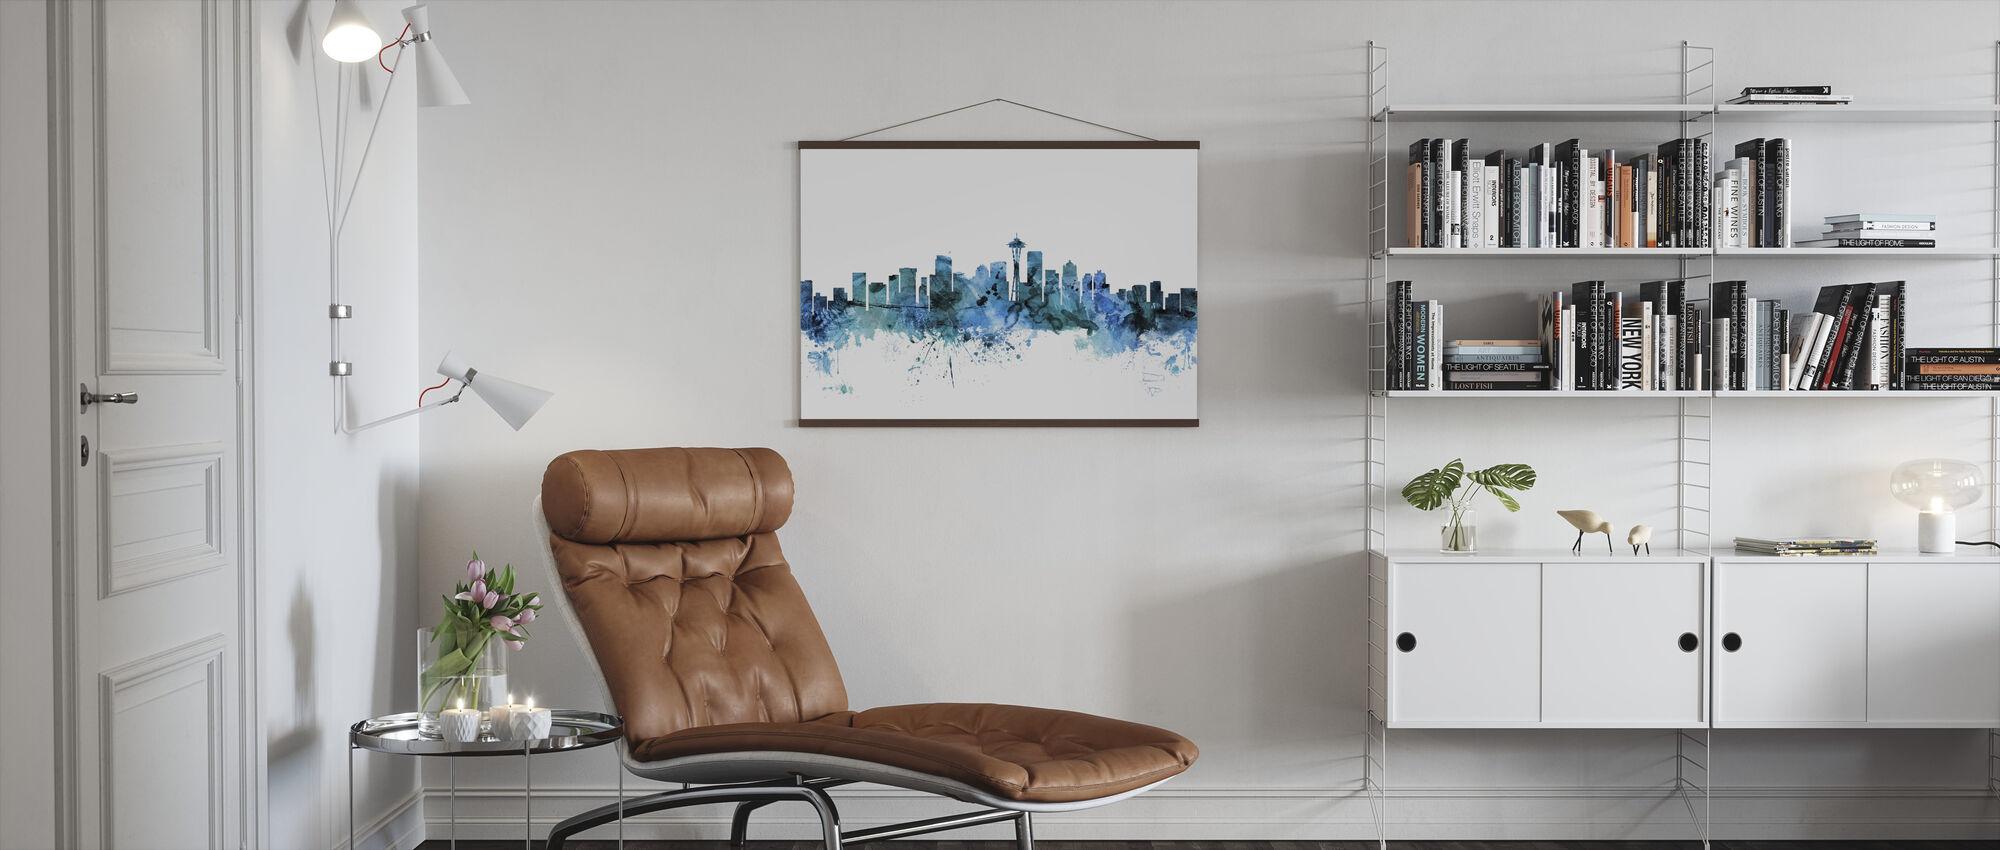 Seattle Washington Skyline - Poster - Living Room